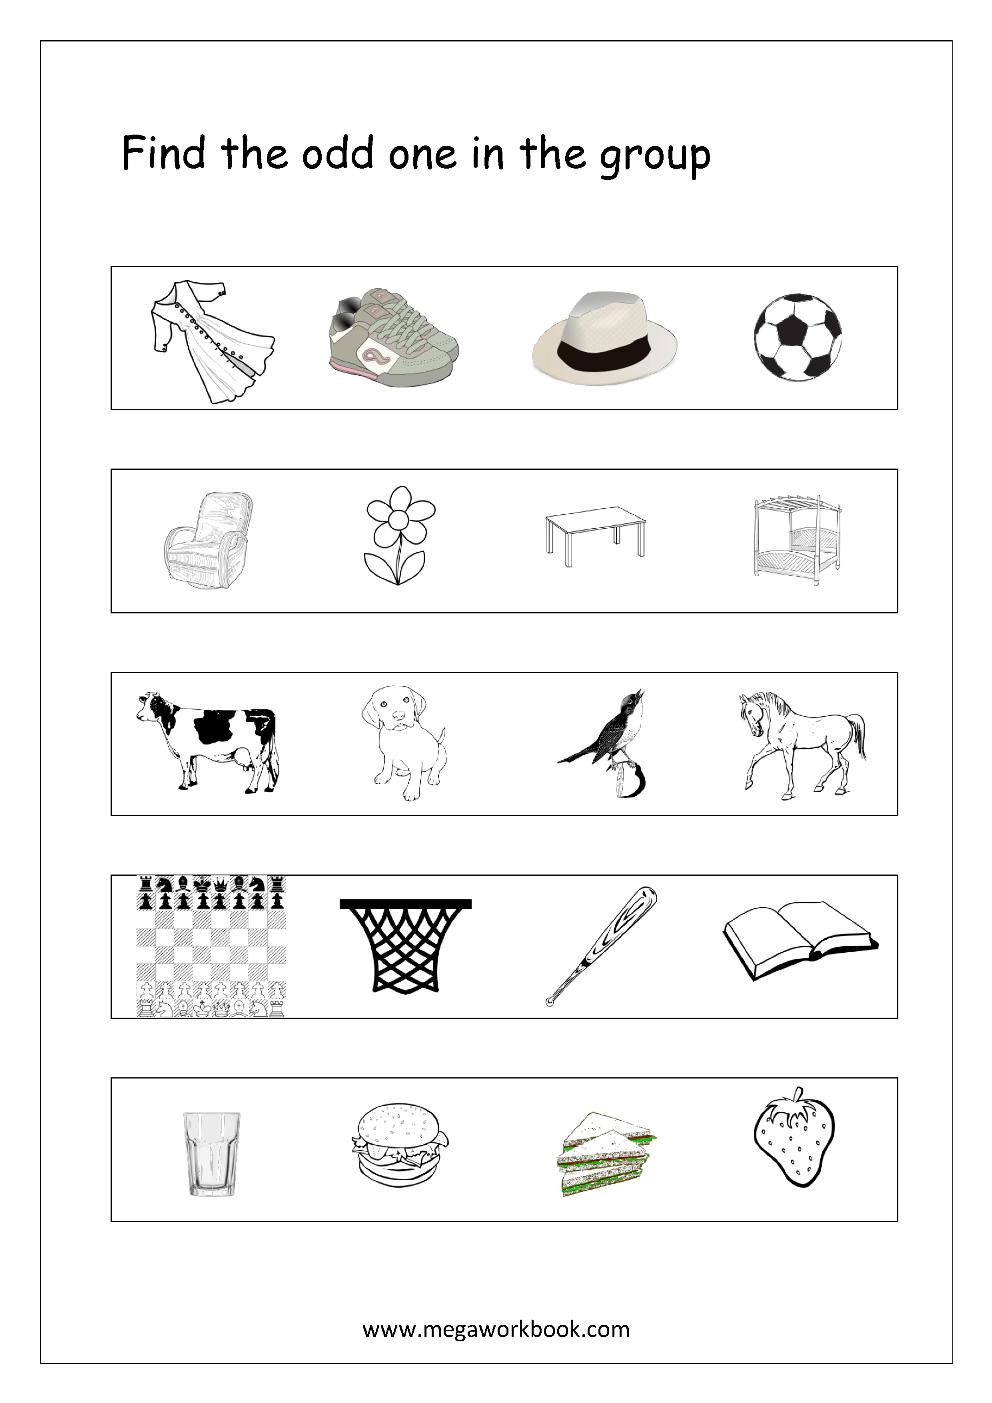 Free General Aptitude Worksheets - Odd One Out - Megaworkbook - Free Printable Aptitude Test